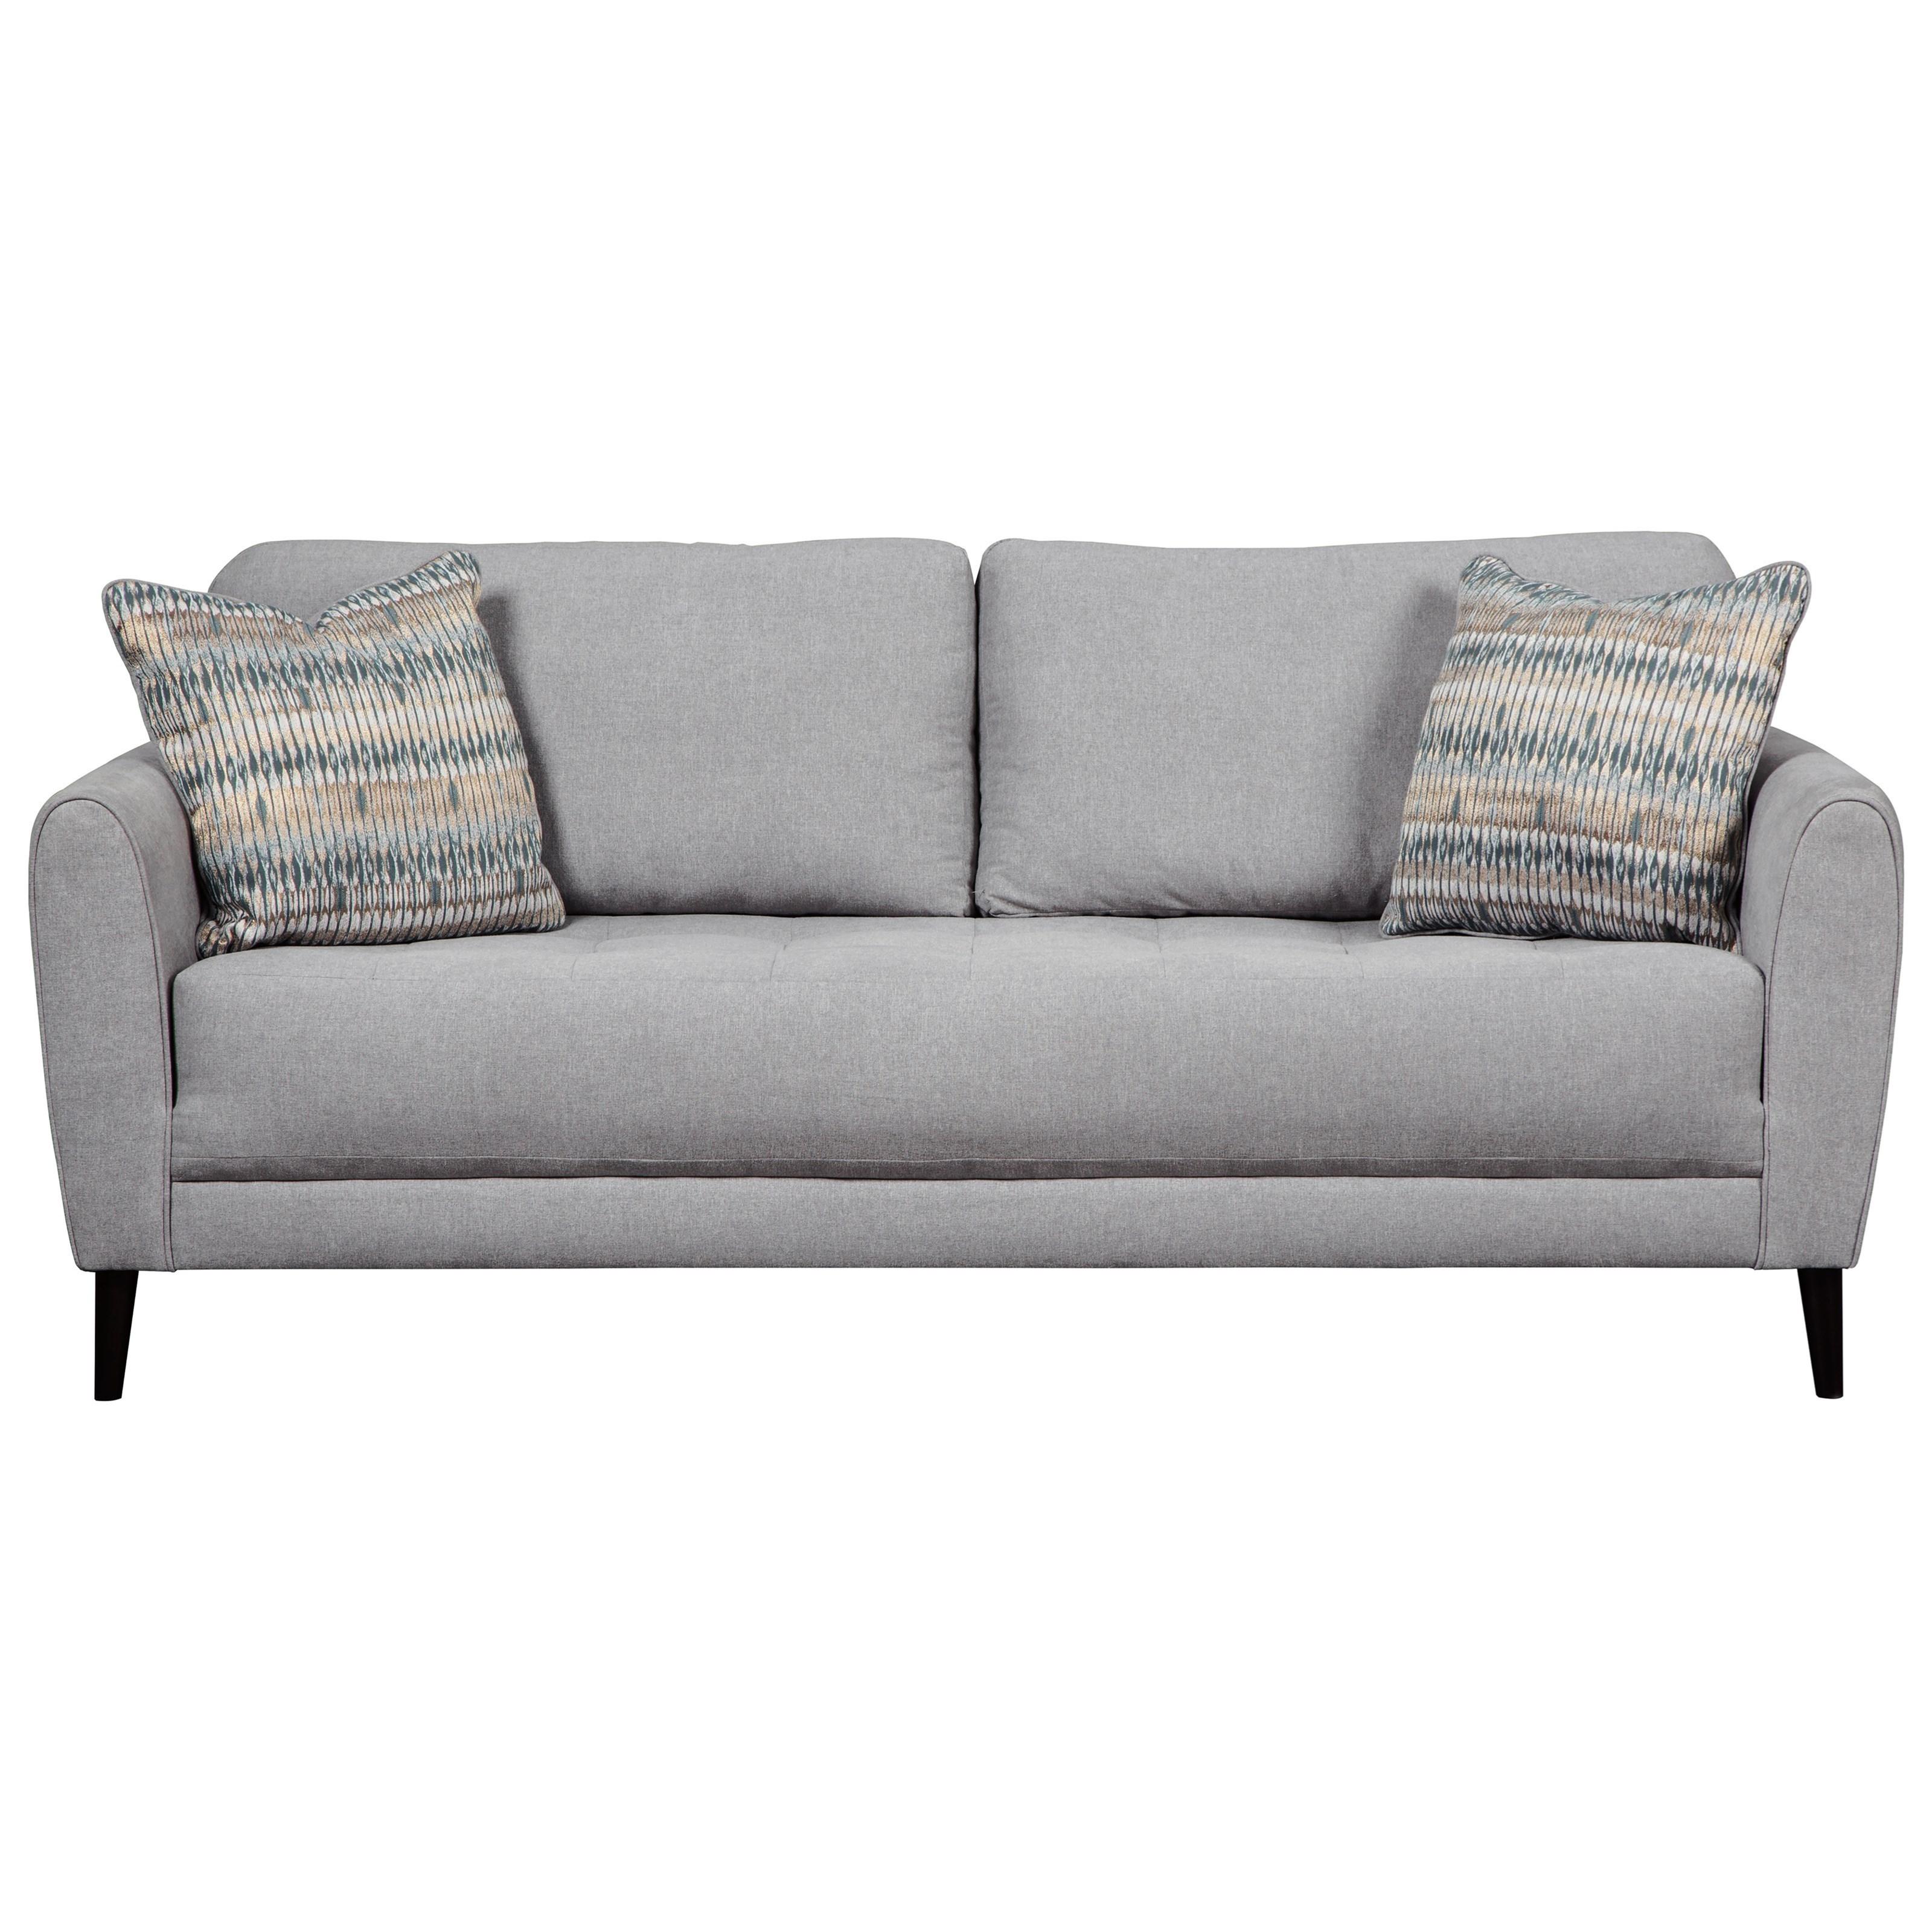 Merveilleux Signature Design By Ashley Cardello Contemporary Sofa